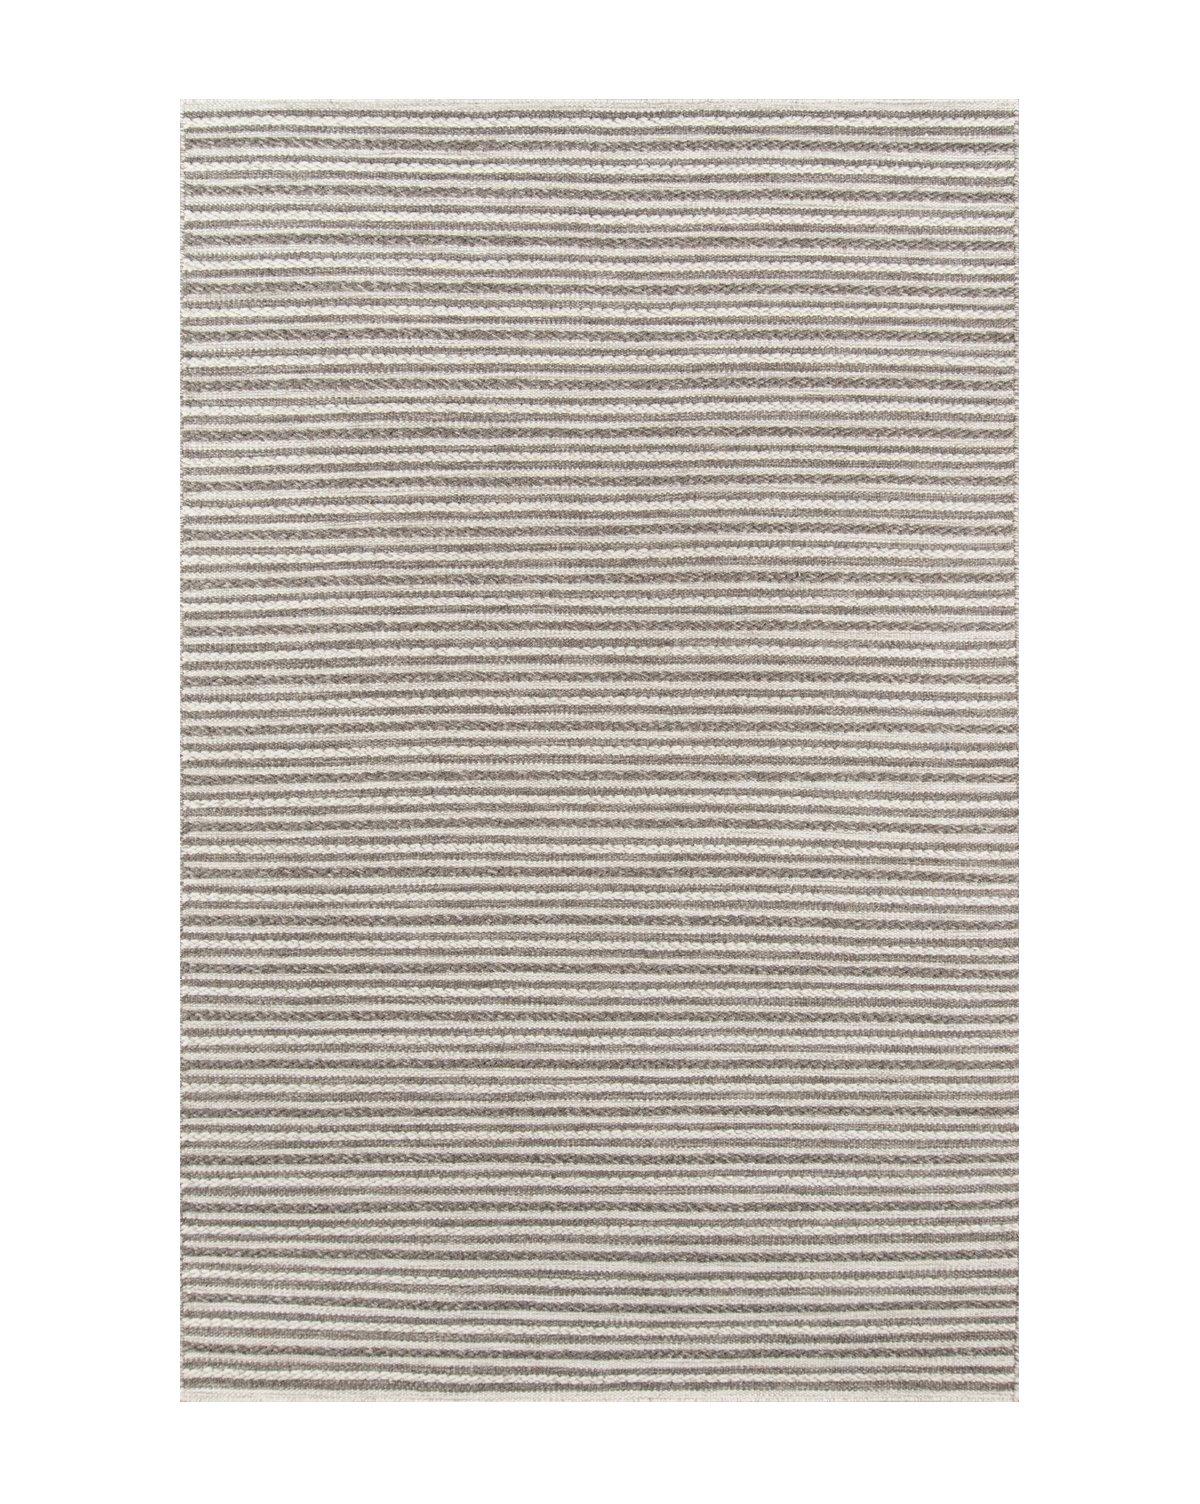 Coventry_Hand-Woven_Wool_Rug_1.jpg